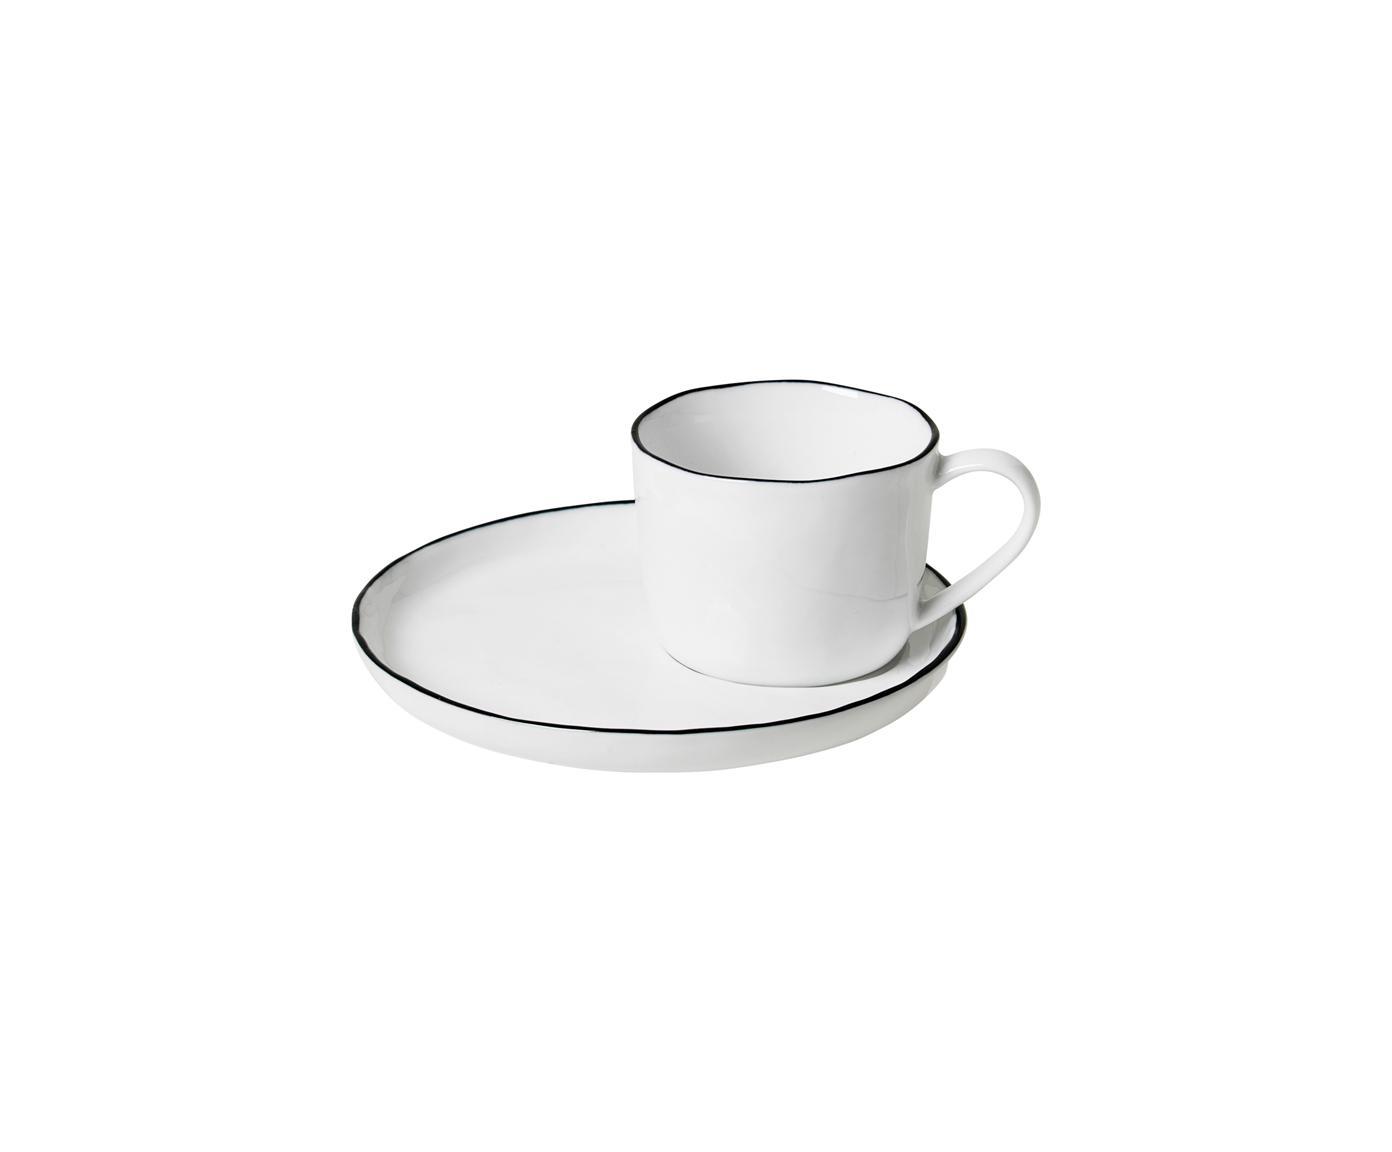 Tazzina caffè fatta a mano Salt 2 pz, Porcellana, Bianco latteo Bordo: nero, Ø 6 x Alt. 5 cm